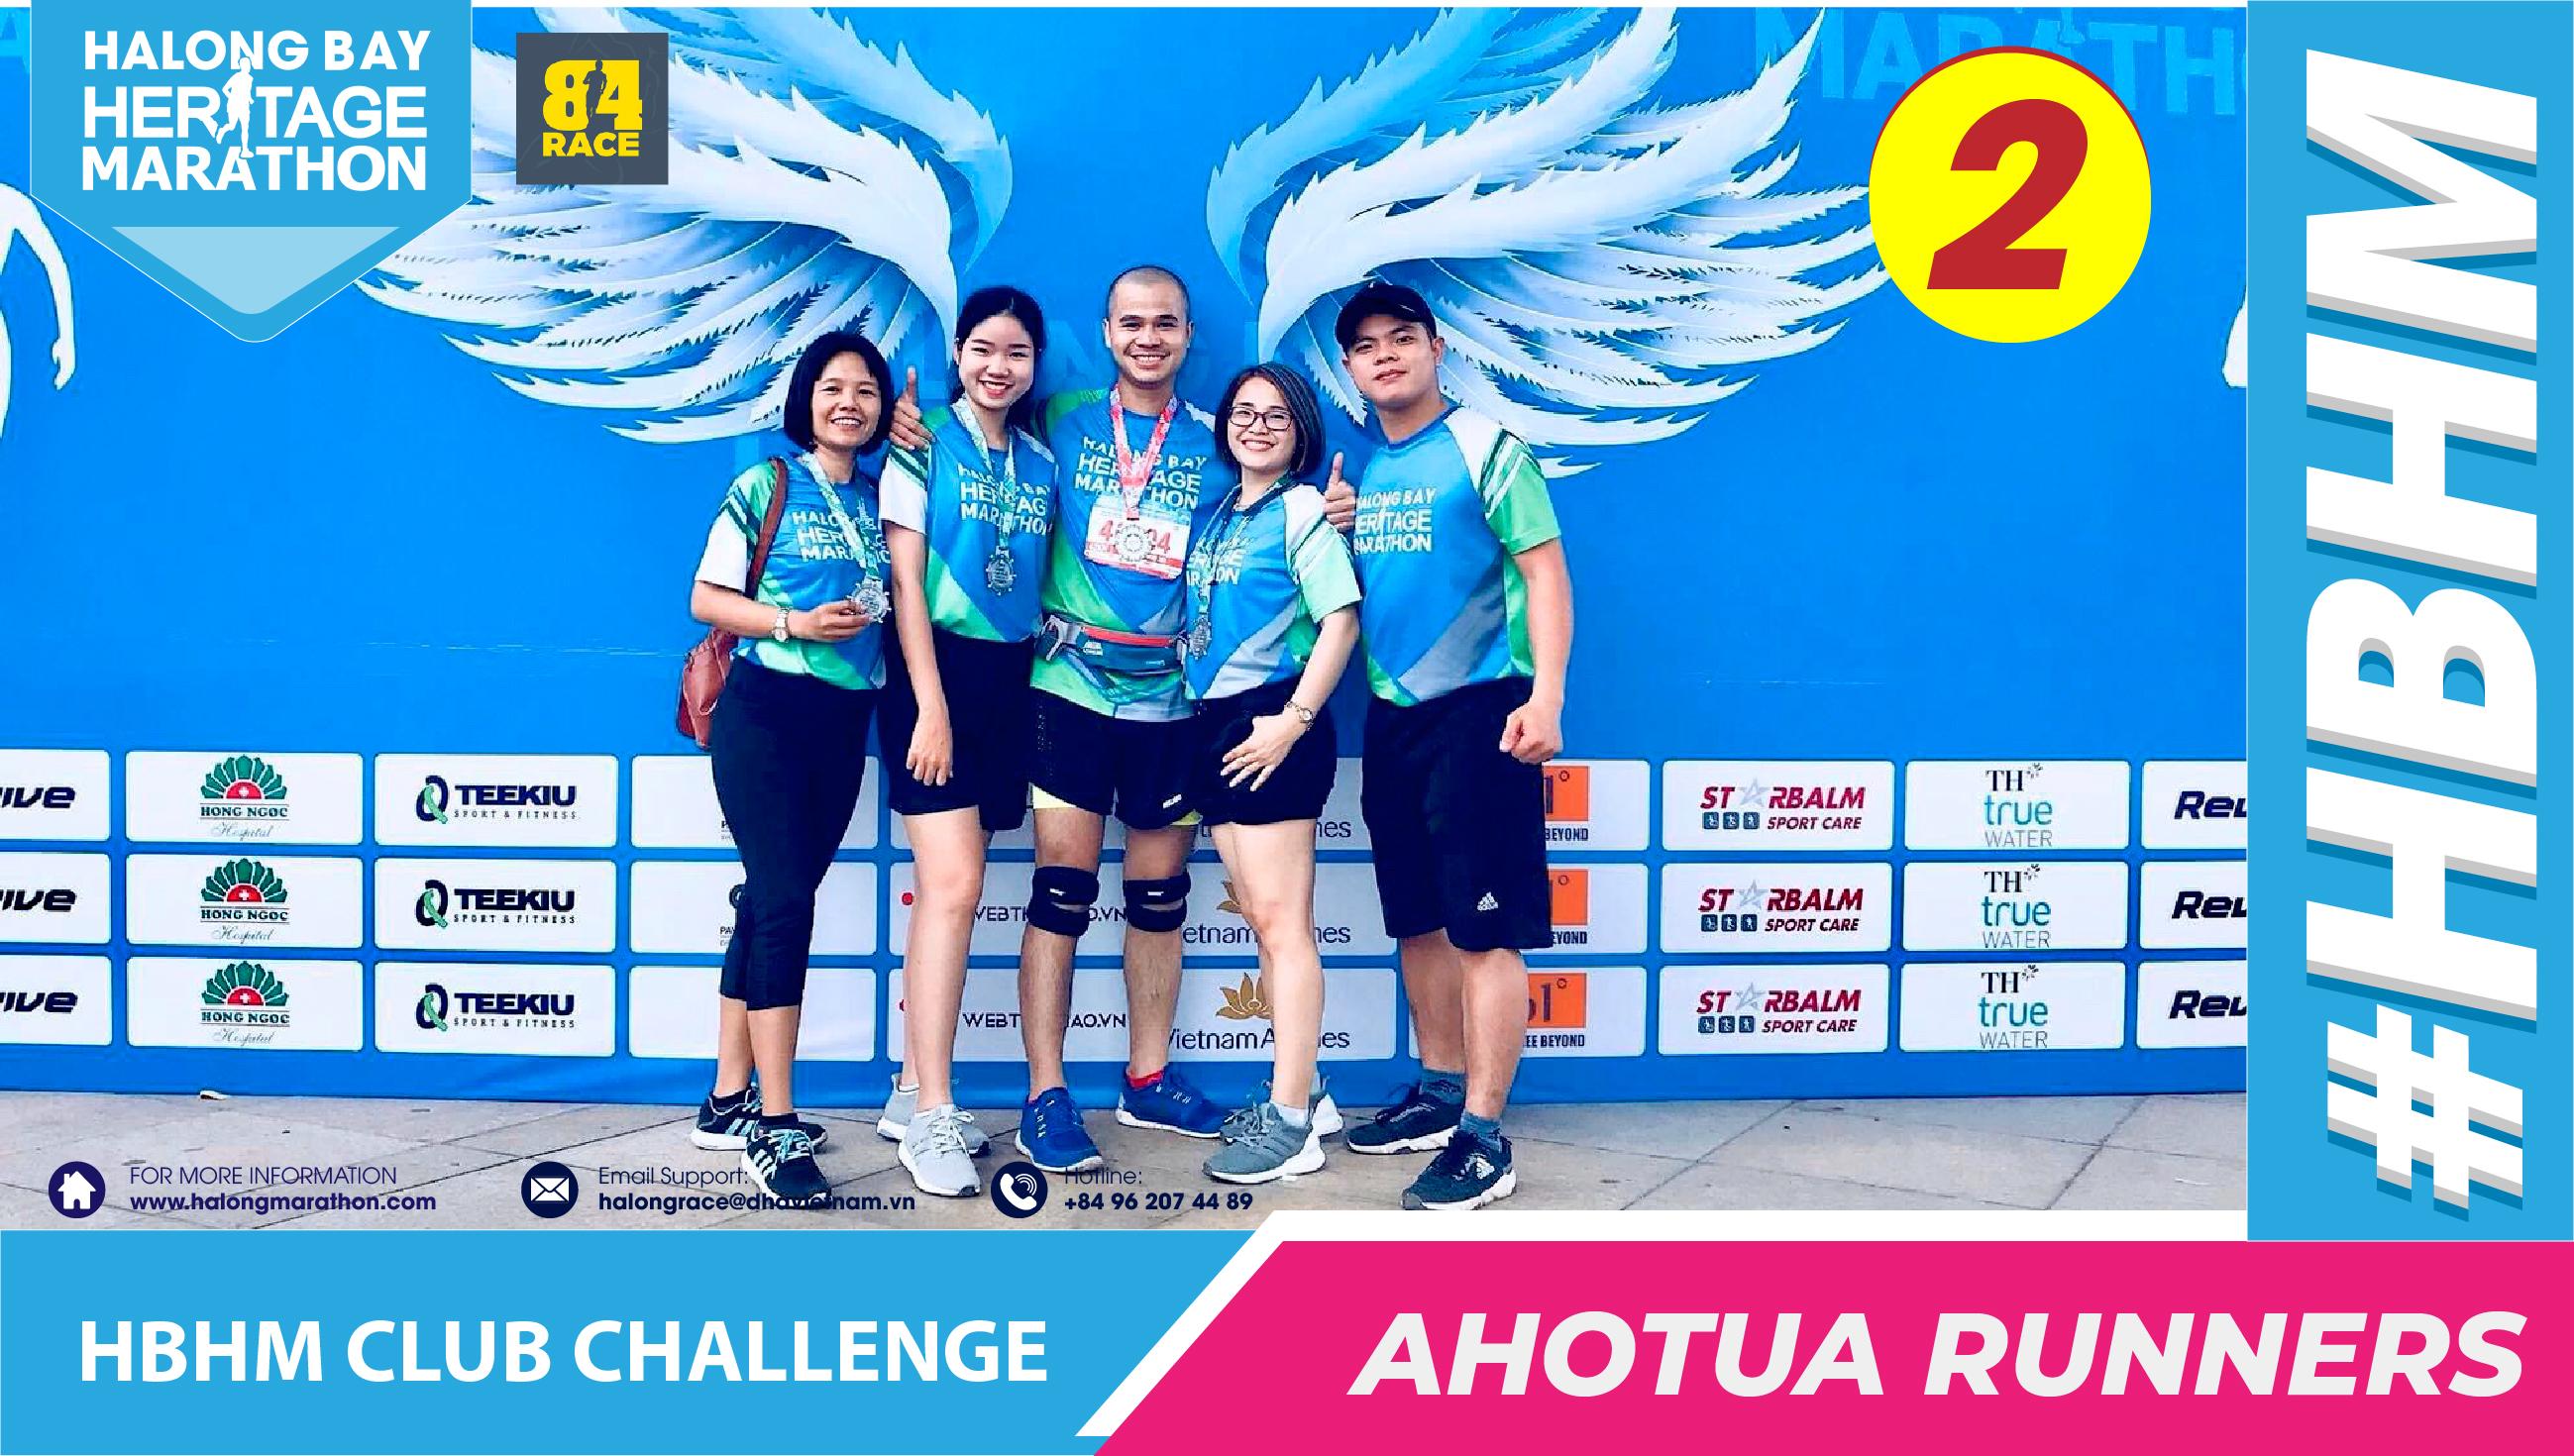 HBHM Challenge 2020 - Ahotua Runner 2